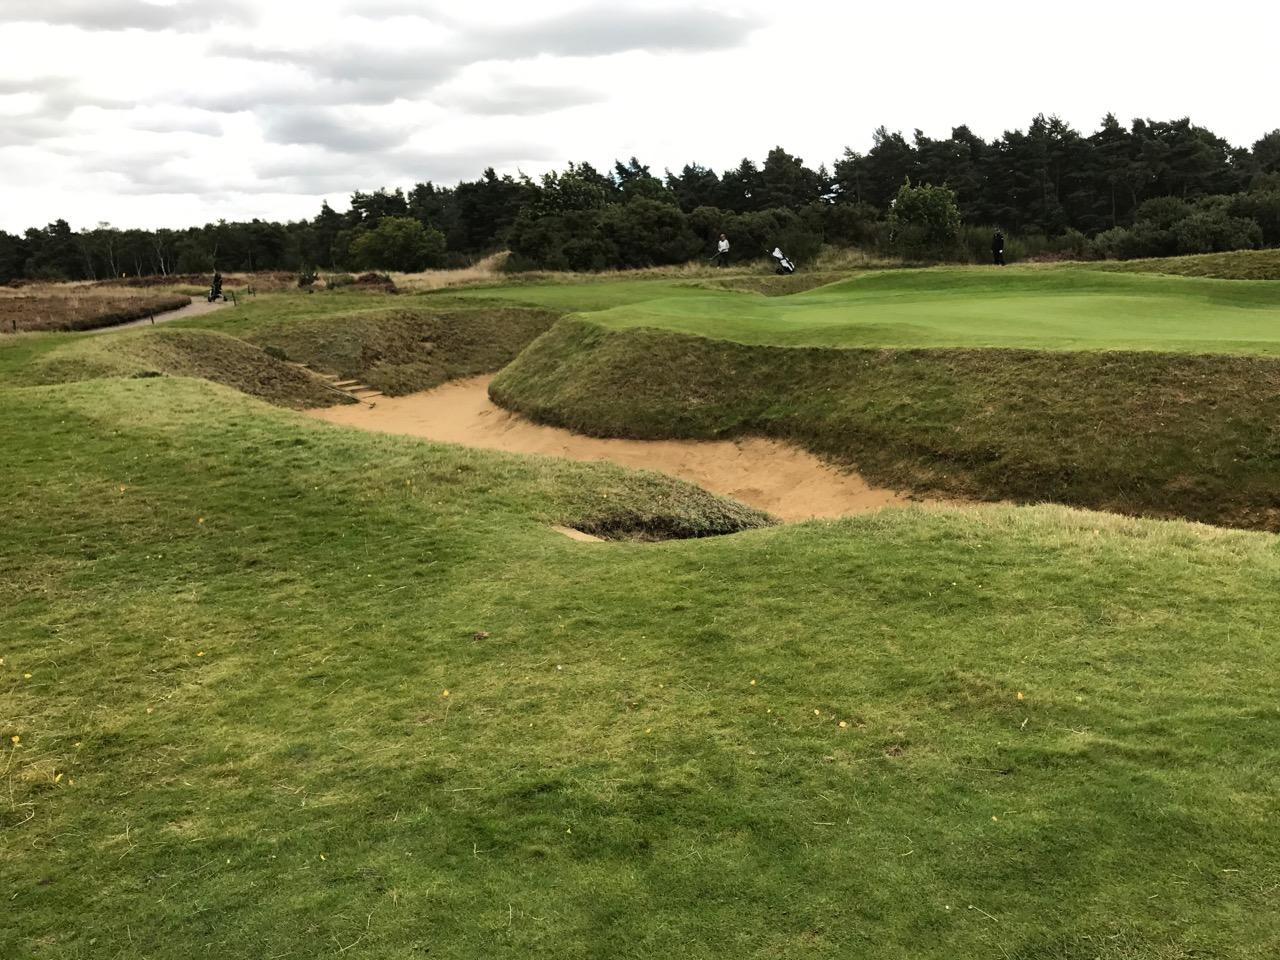 Bunker am Par 3 Loch 5